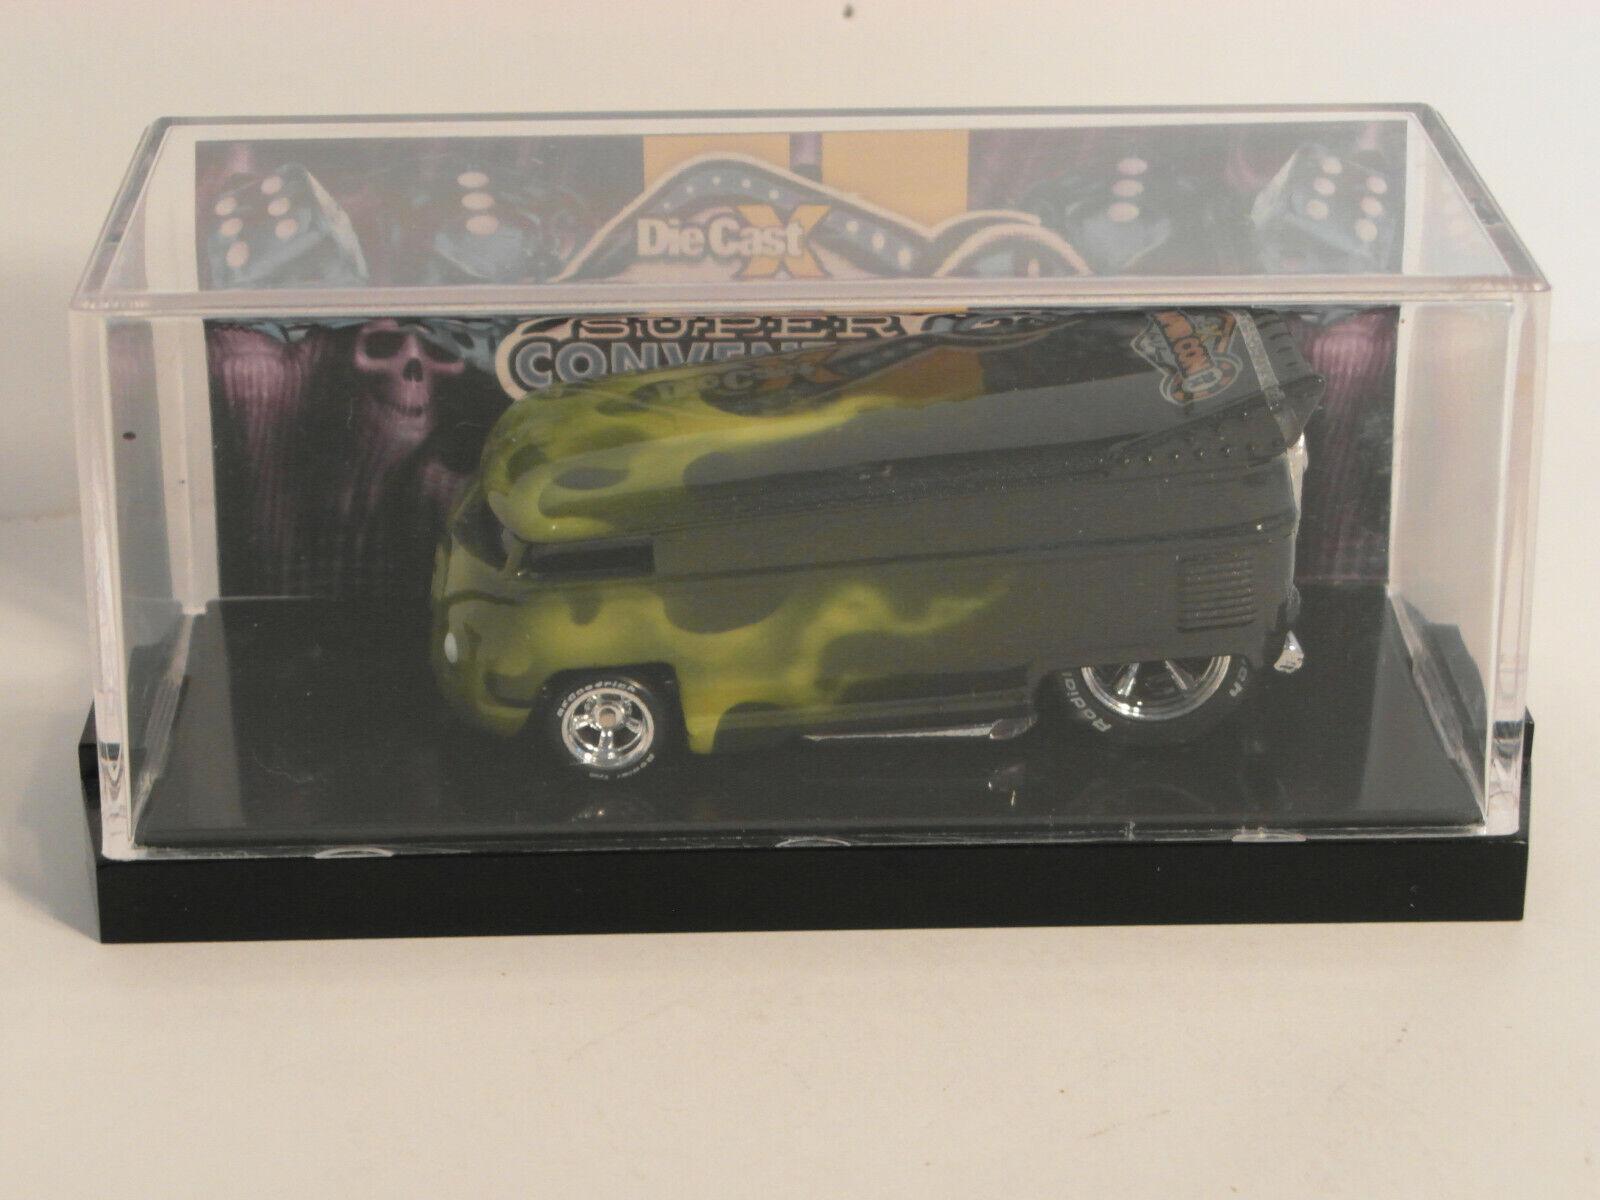 2014 DiecastX Super Convention Las Vegas VW DRAG BUS  by POPE DESIGNS 1 6